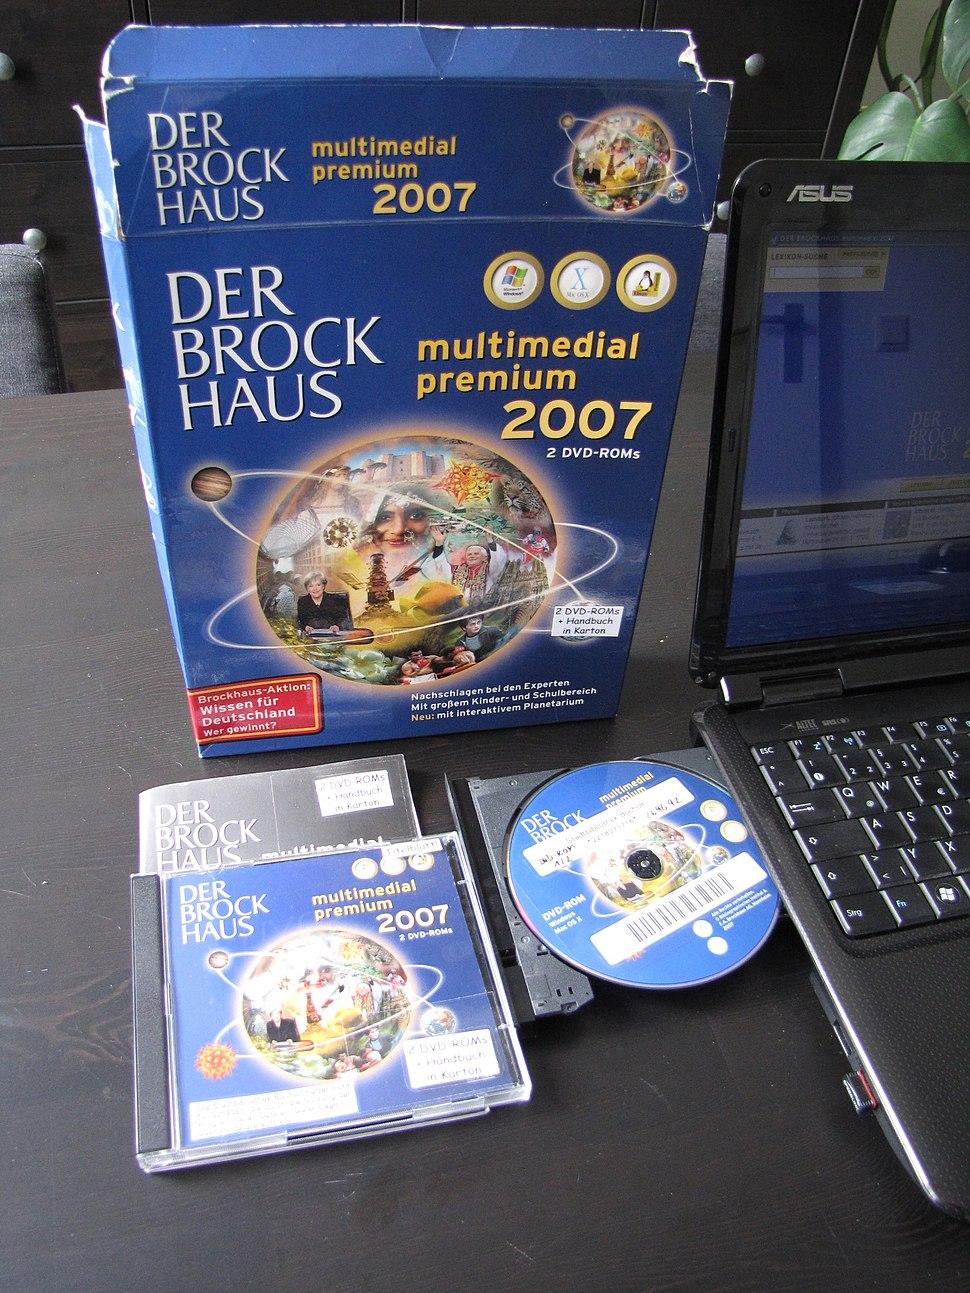 Brockhaus 2007 dvd